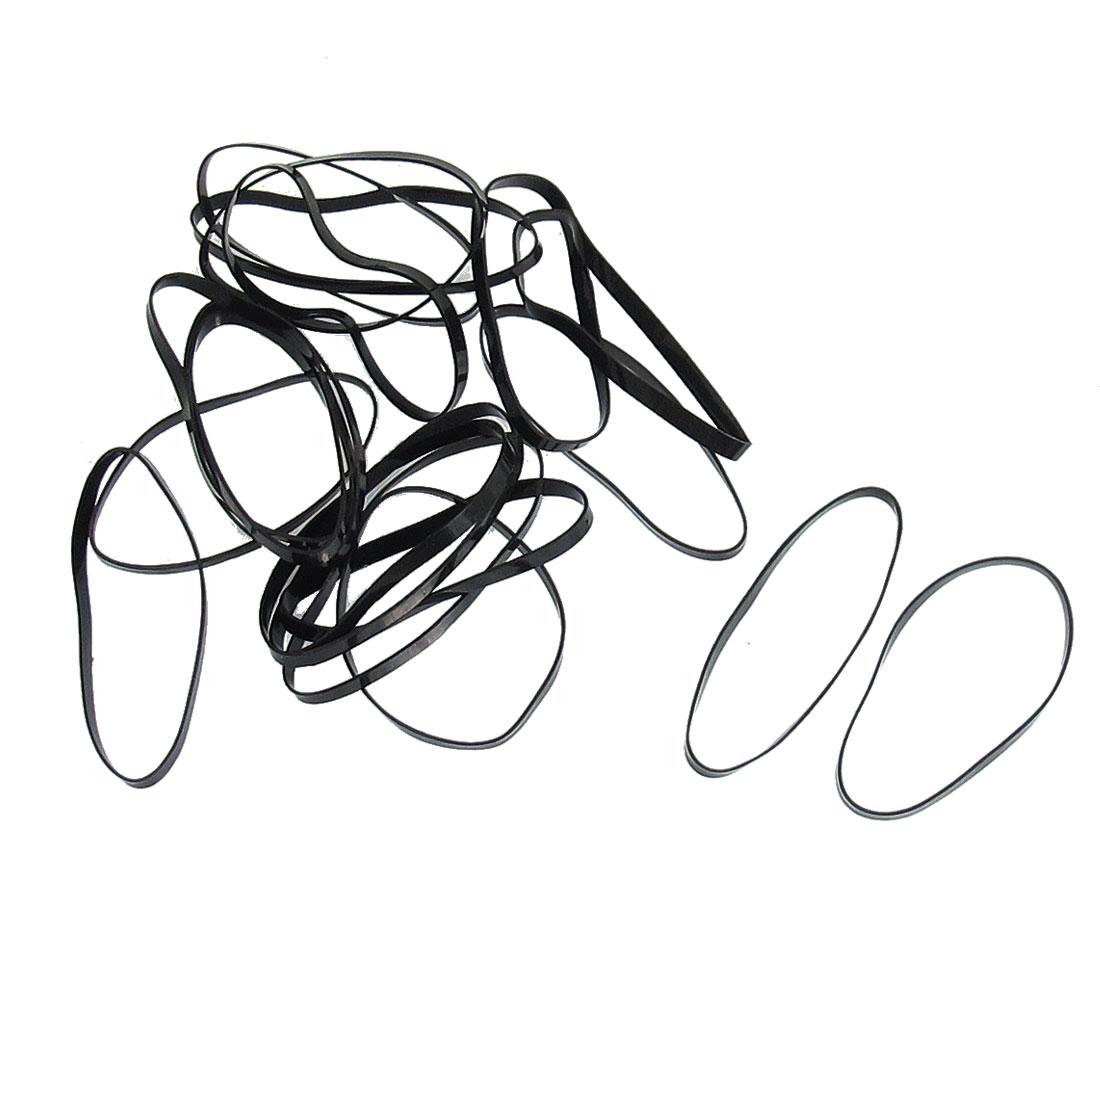 Lady Black Ponytail Braids Holder Stretchy Rubber Hairband Tie 80 Pcs